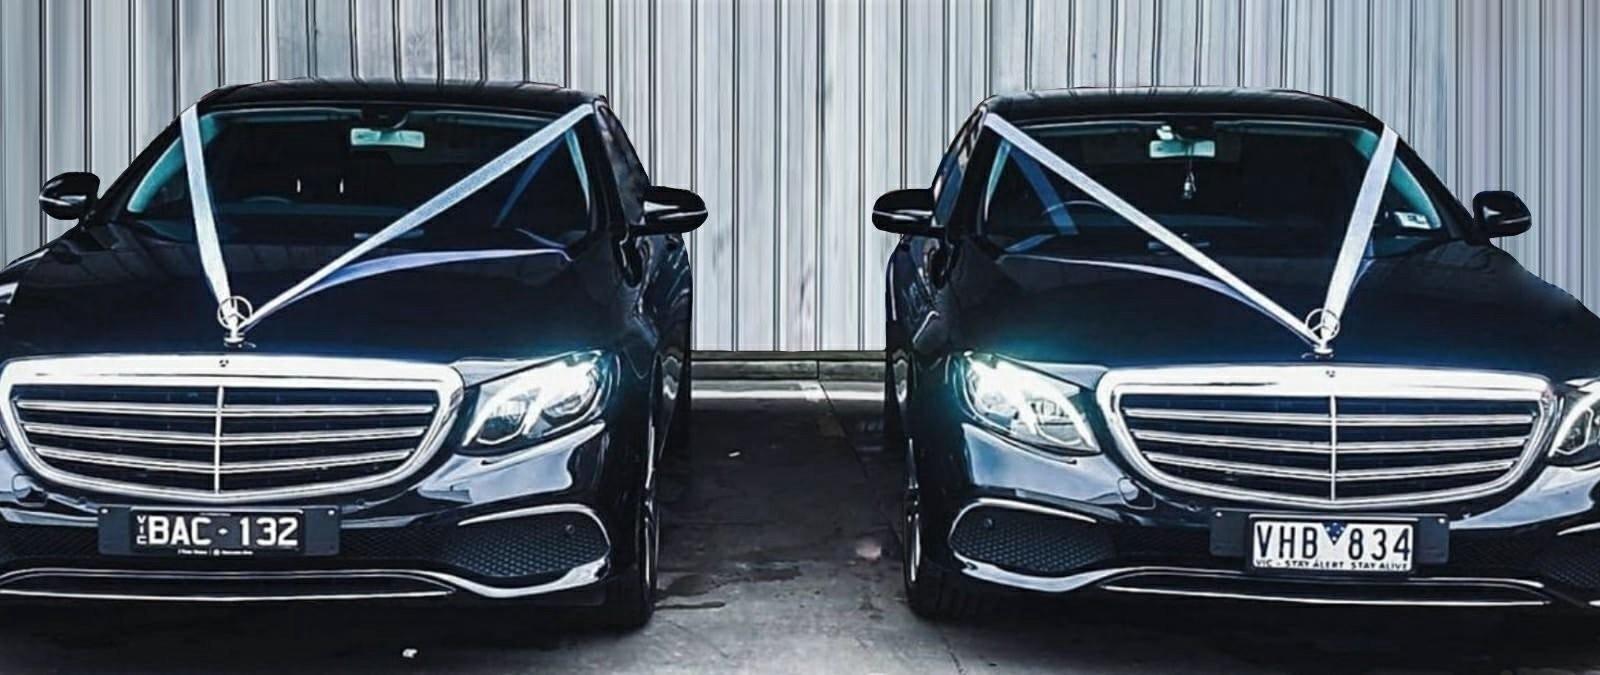 HOW TO CHOSE YOUR WEDDING CAR